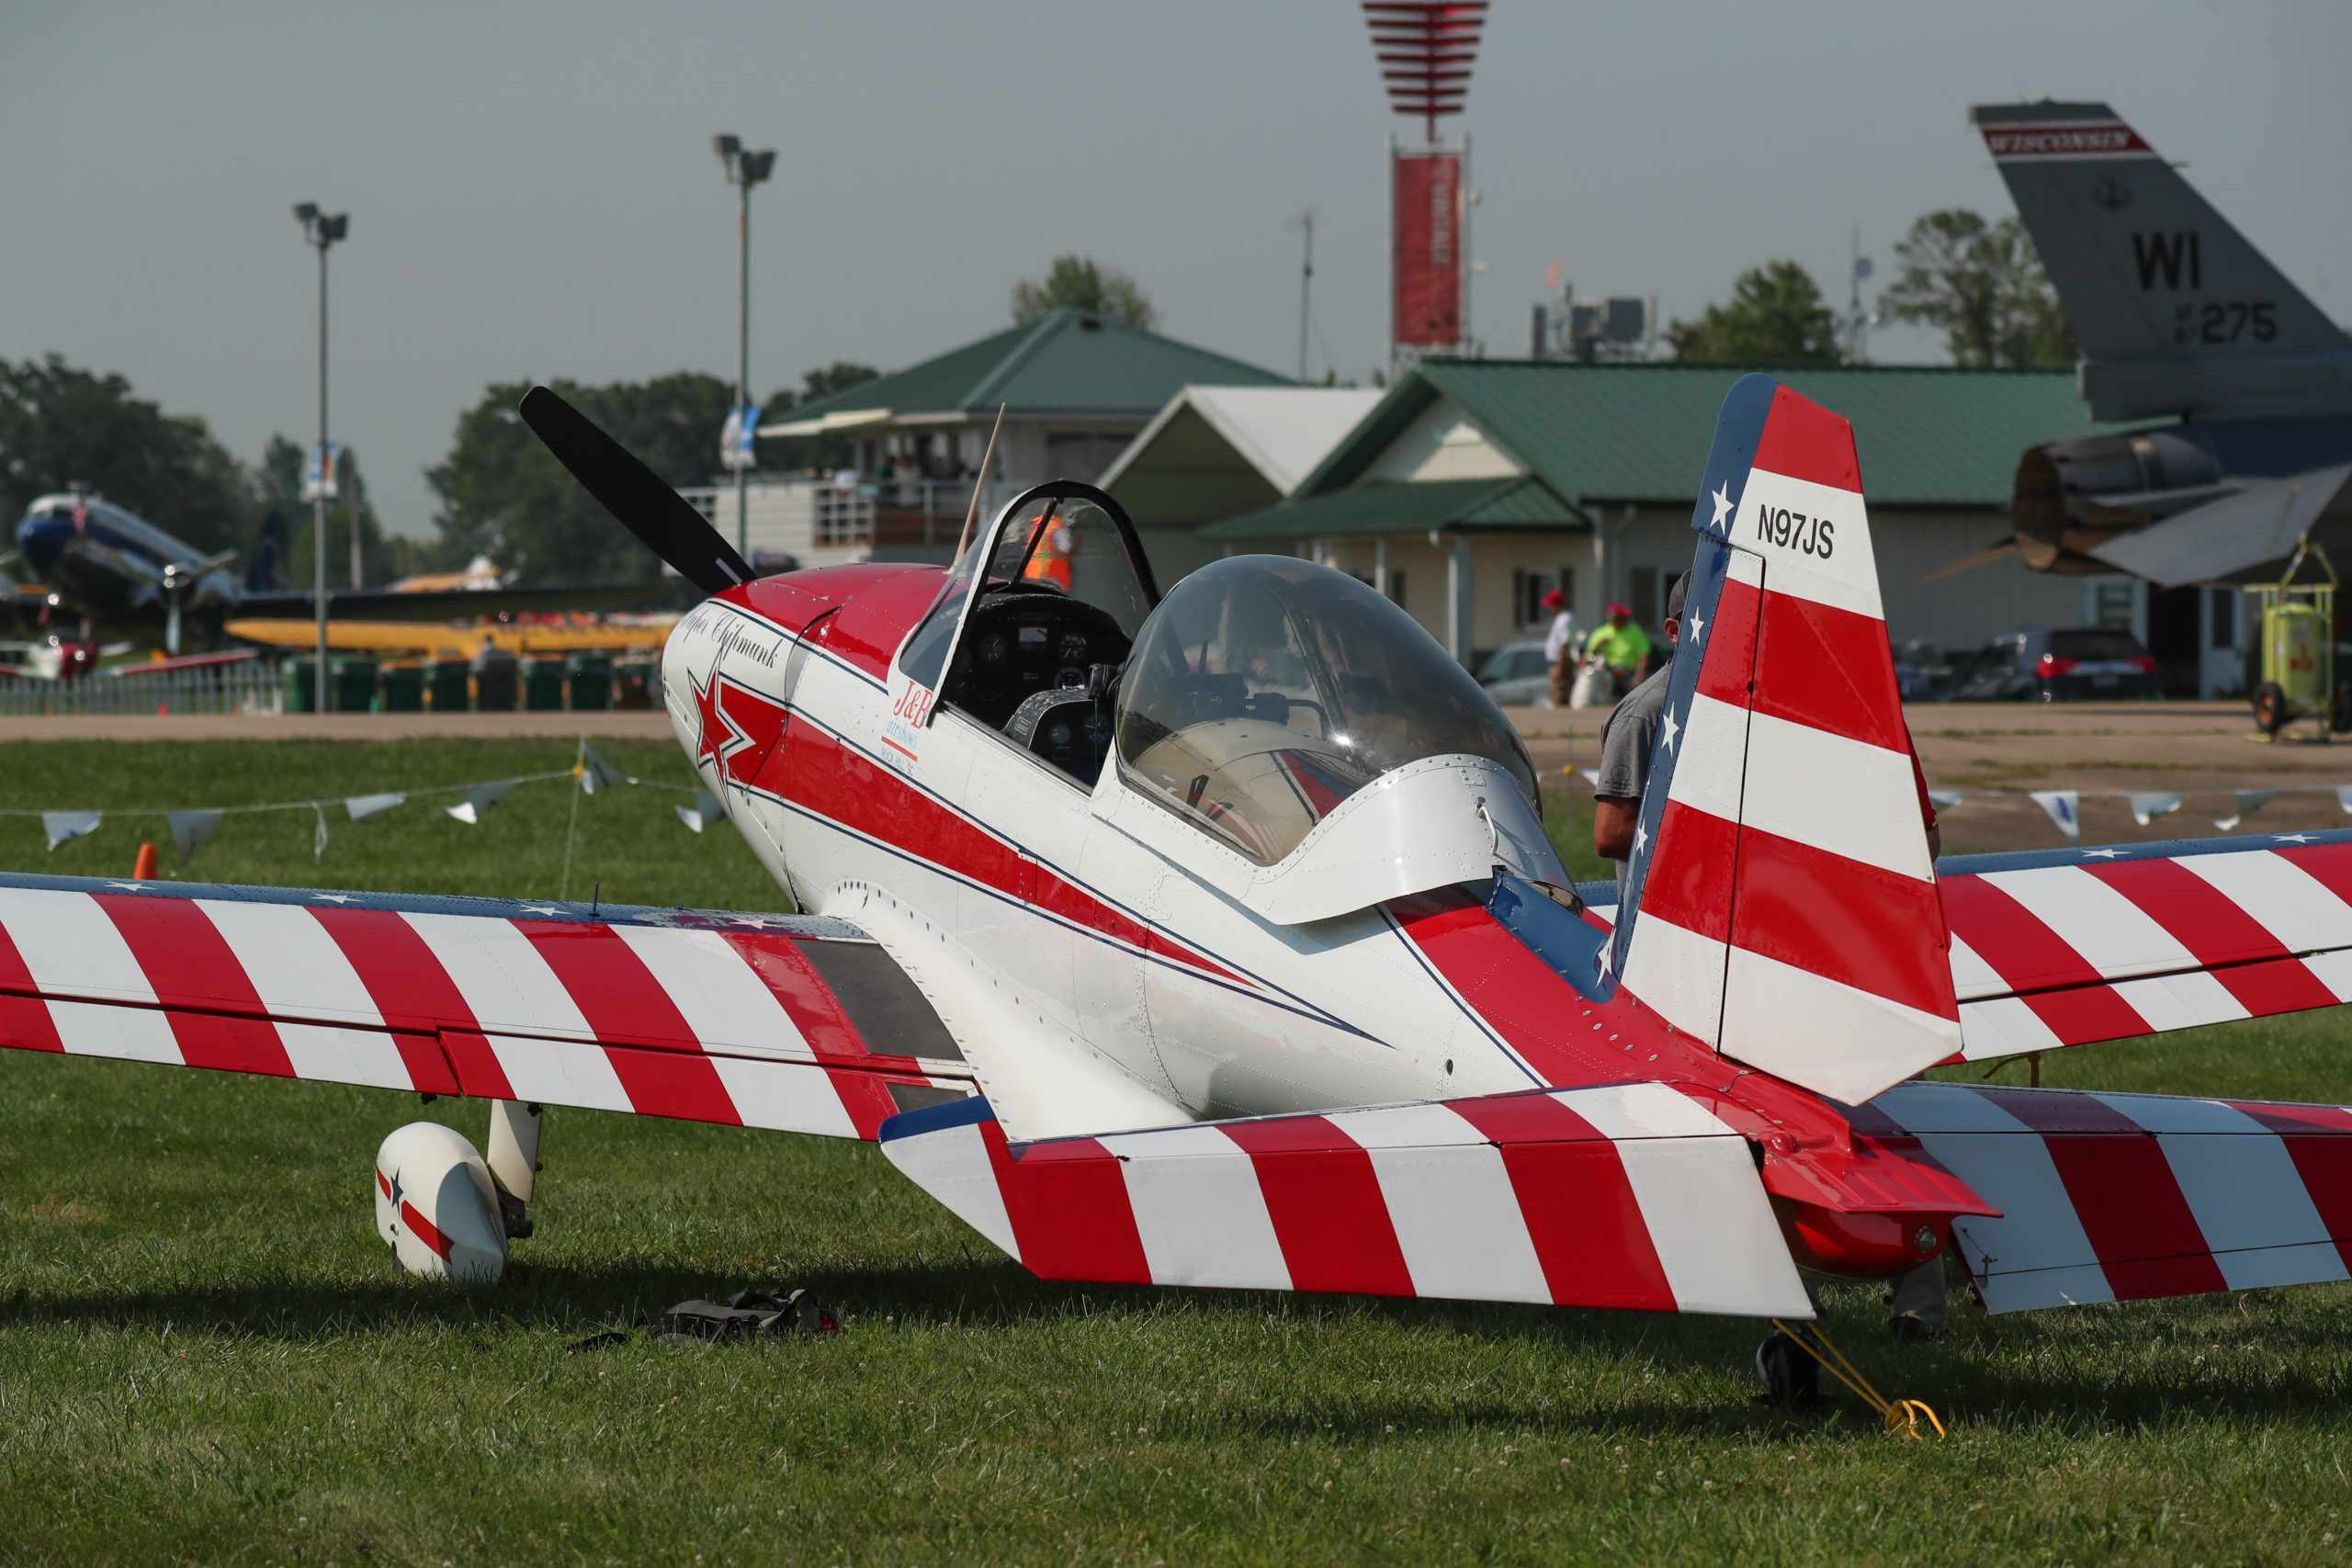 Havilland Super Chipmunk